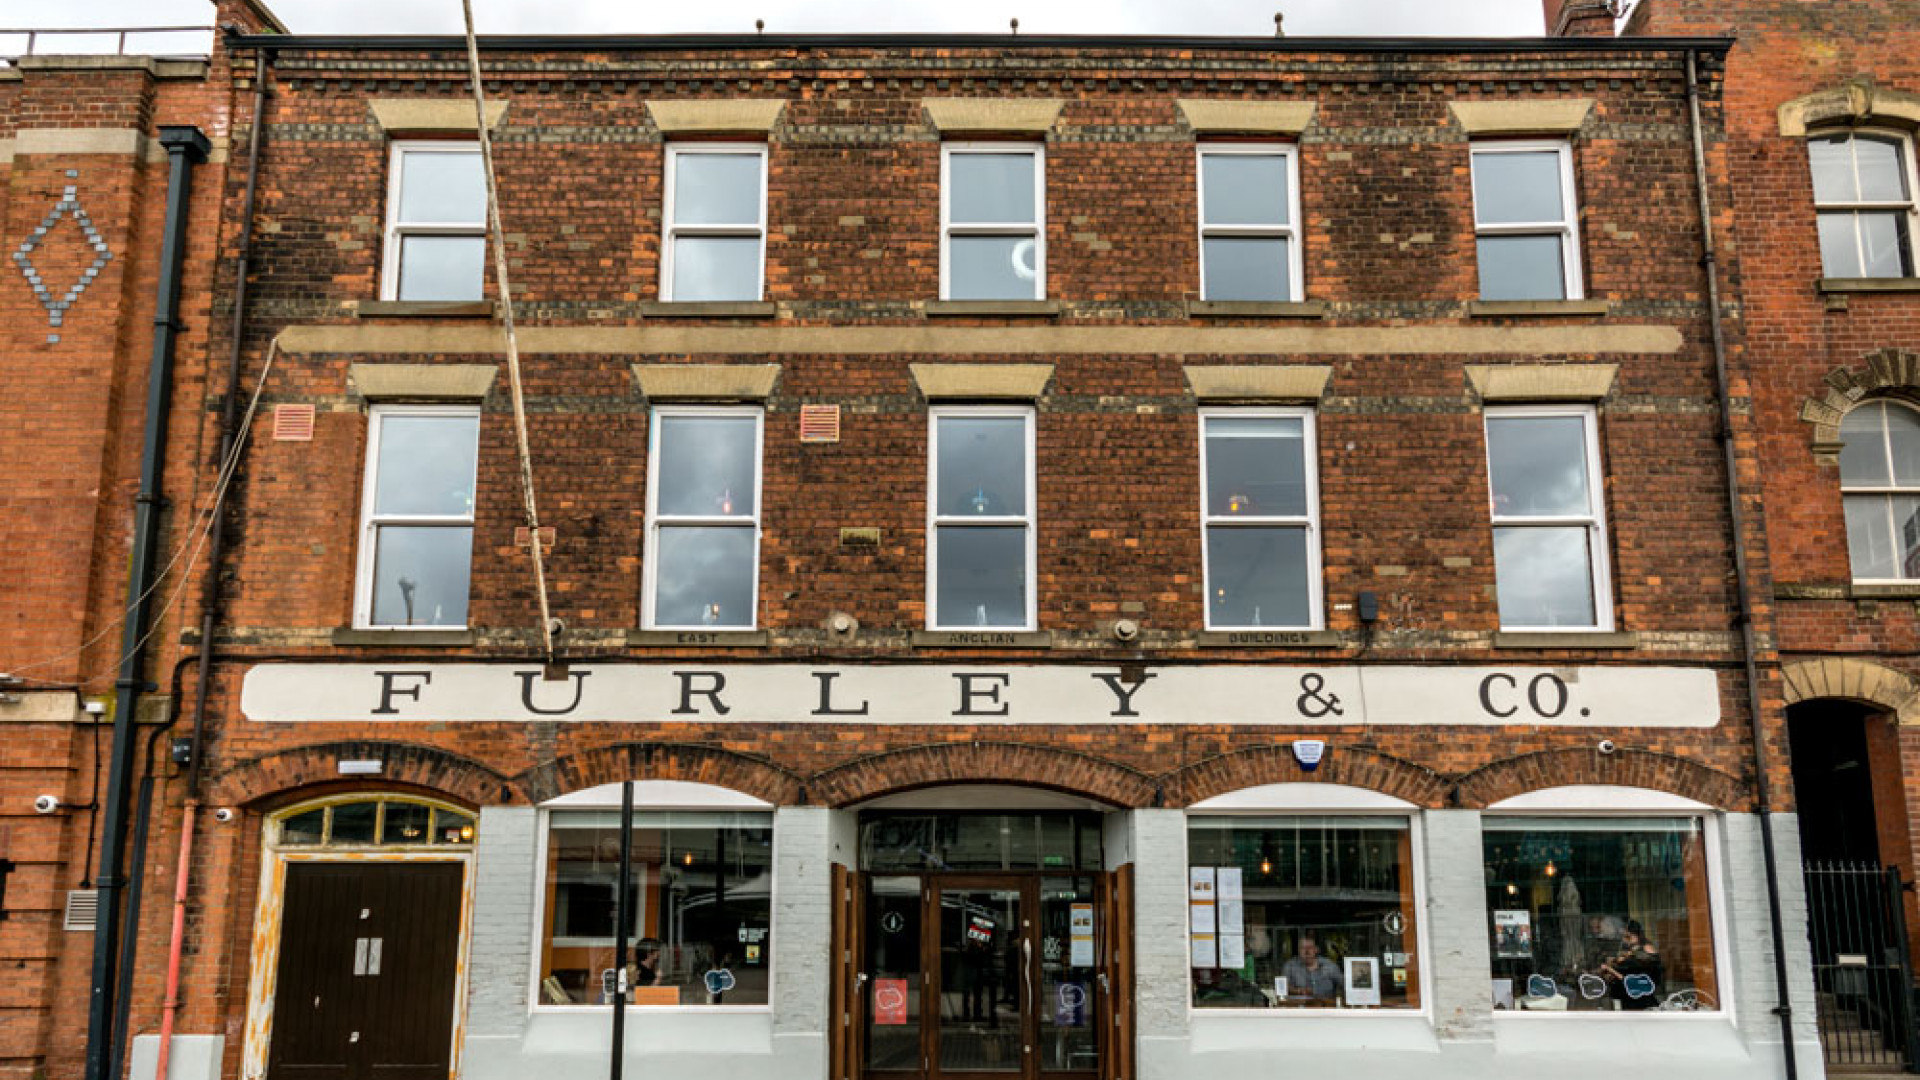 Furley and Co., Kingston upon Hull